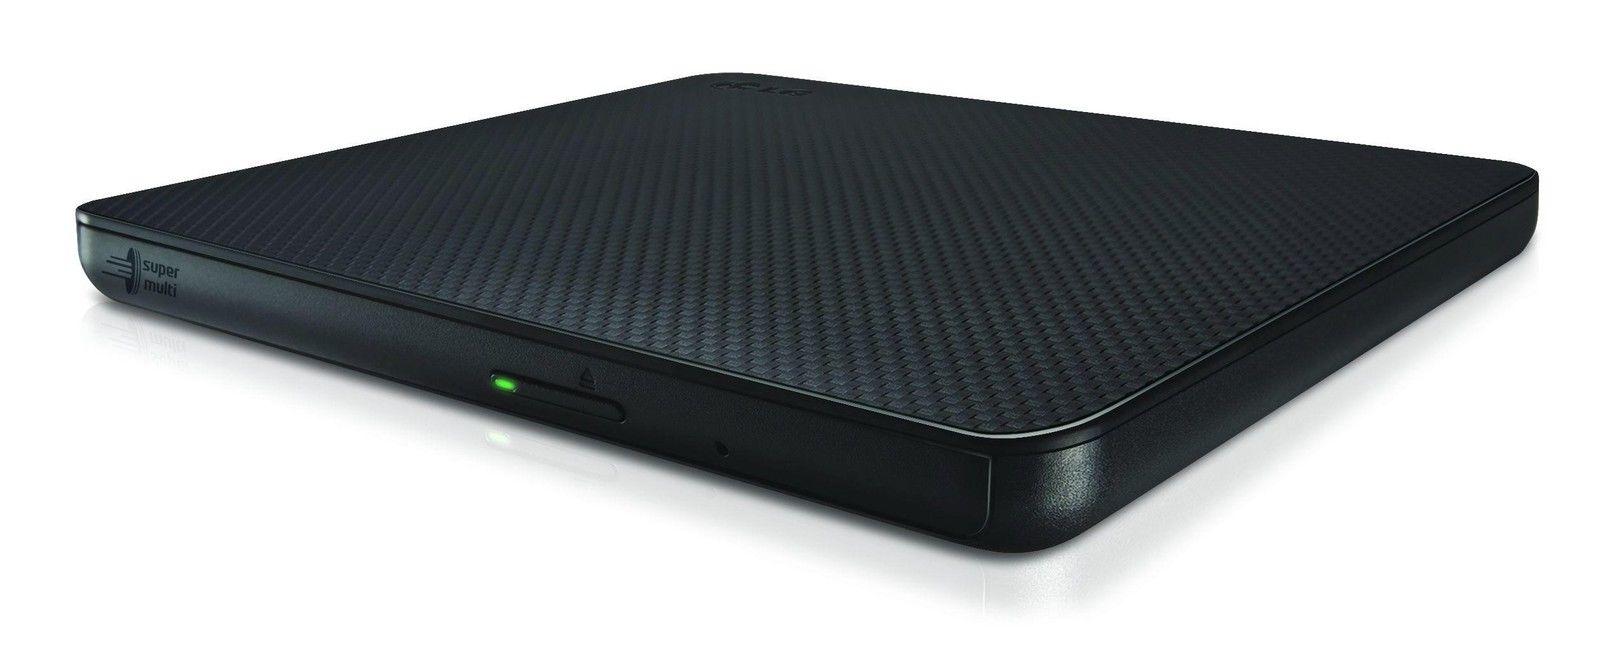 Hitachi-LG USB2 Externe Slim  DVDRW Noir - Graveur - Cybertek.fr - 0